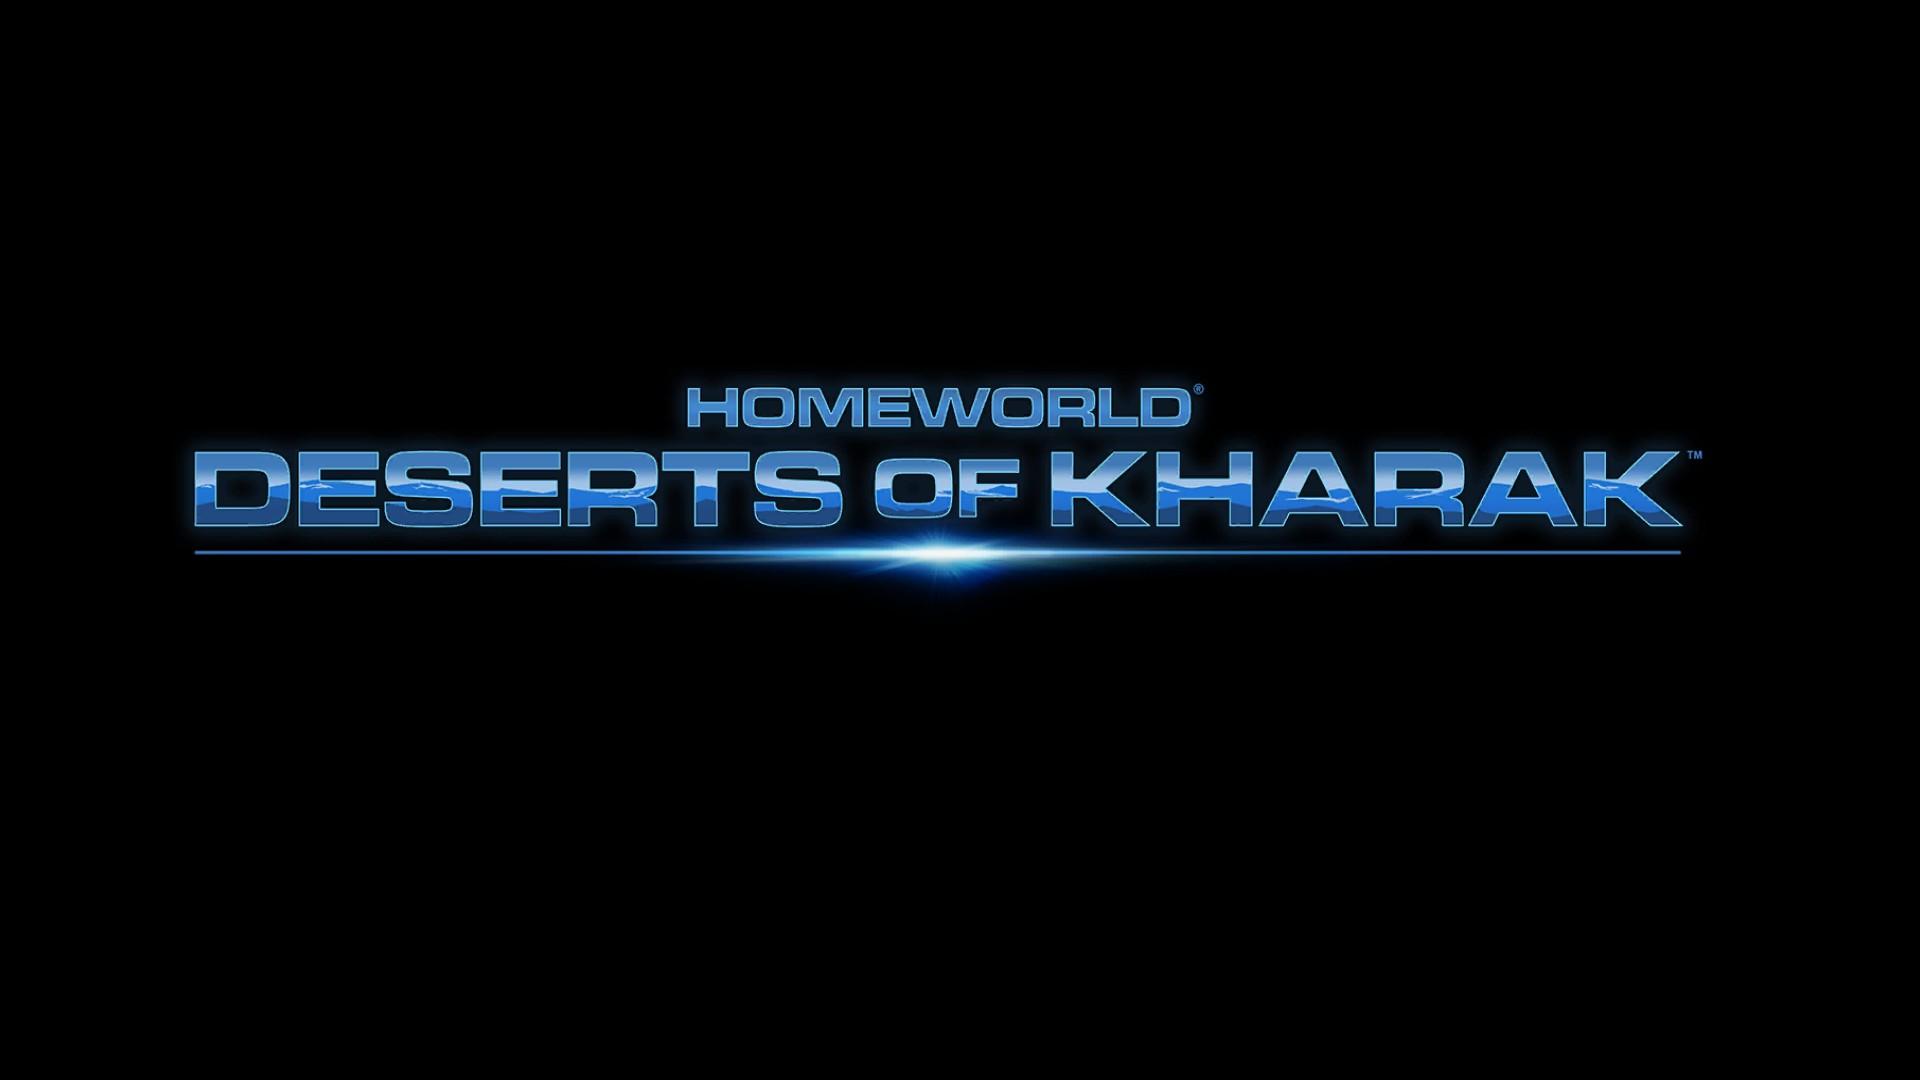 Homeworld: Deserts of Kharak : Bienvenue à Tataouine